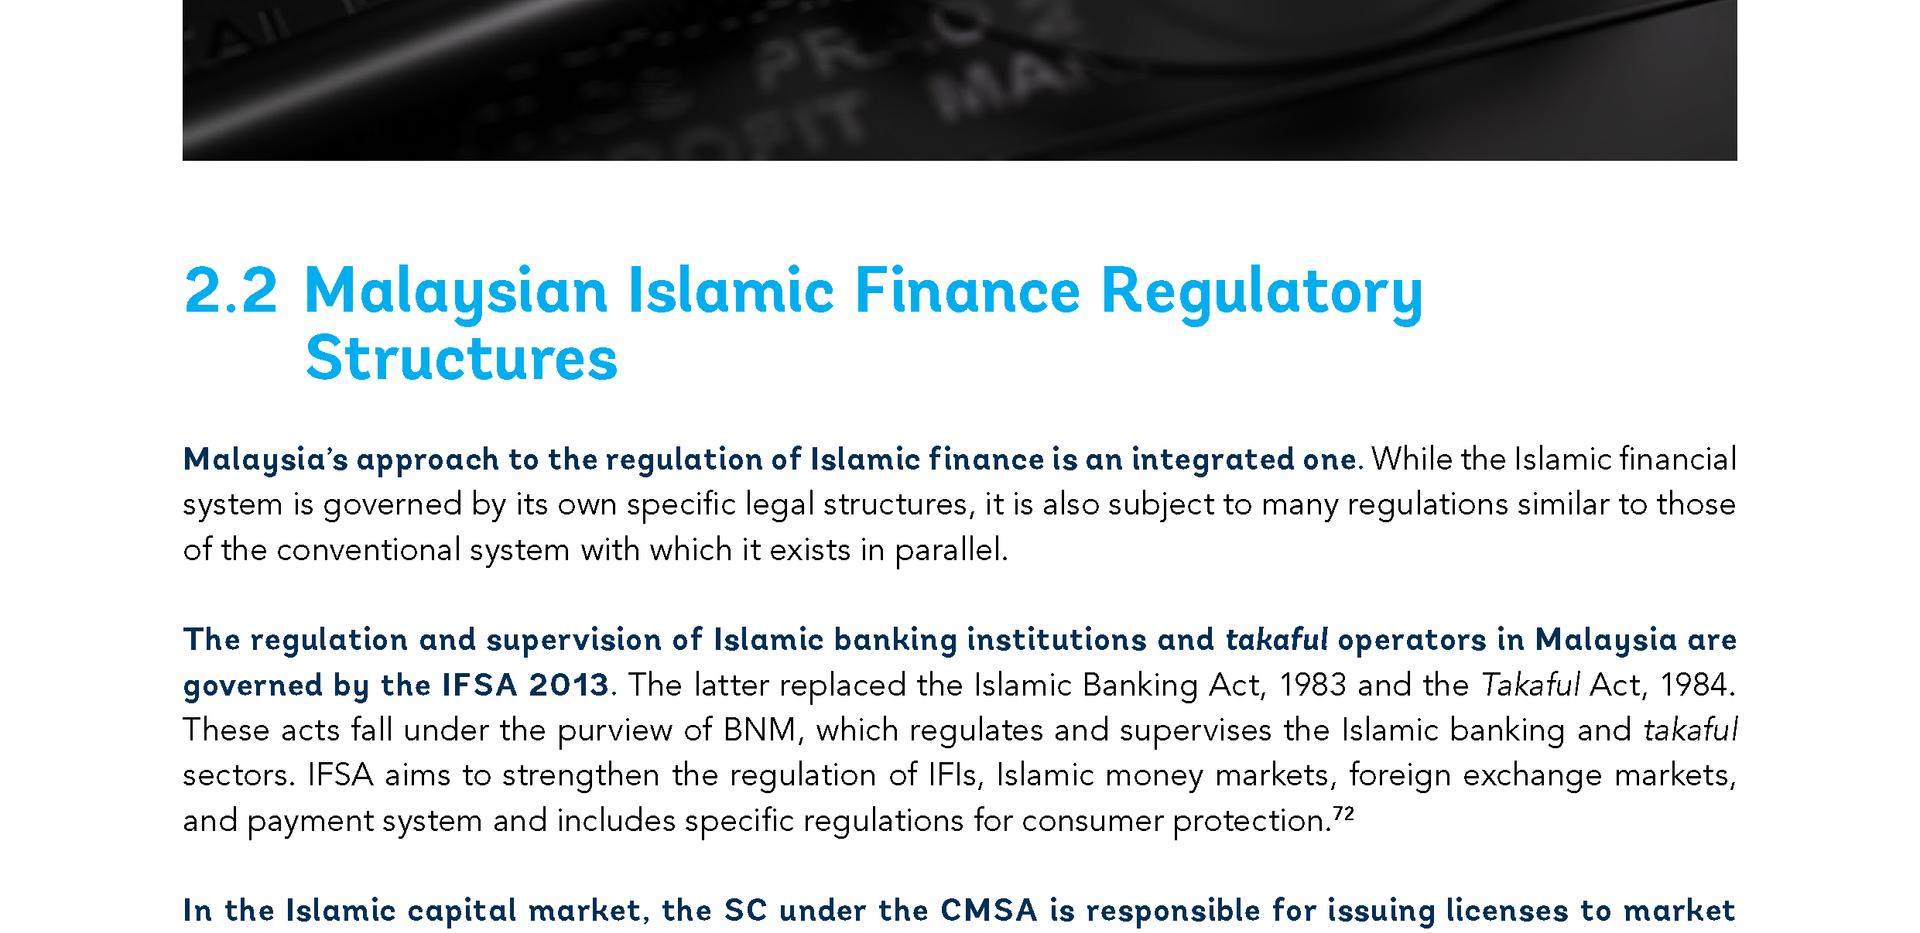 World Bank: Islamic Finance & Financial Inclusiveness (Inside Sample 1)